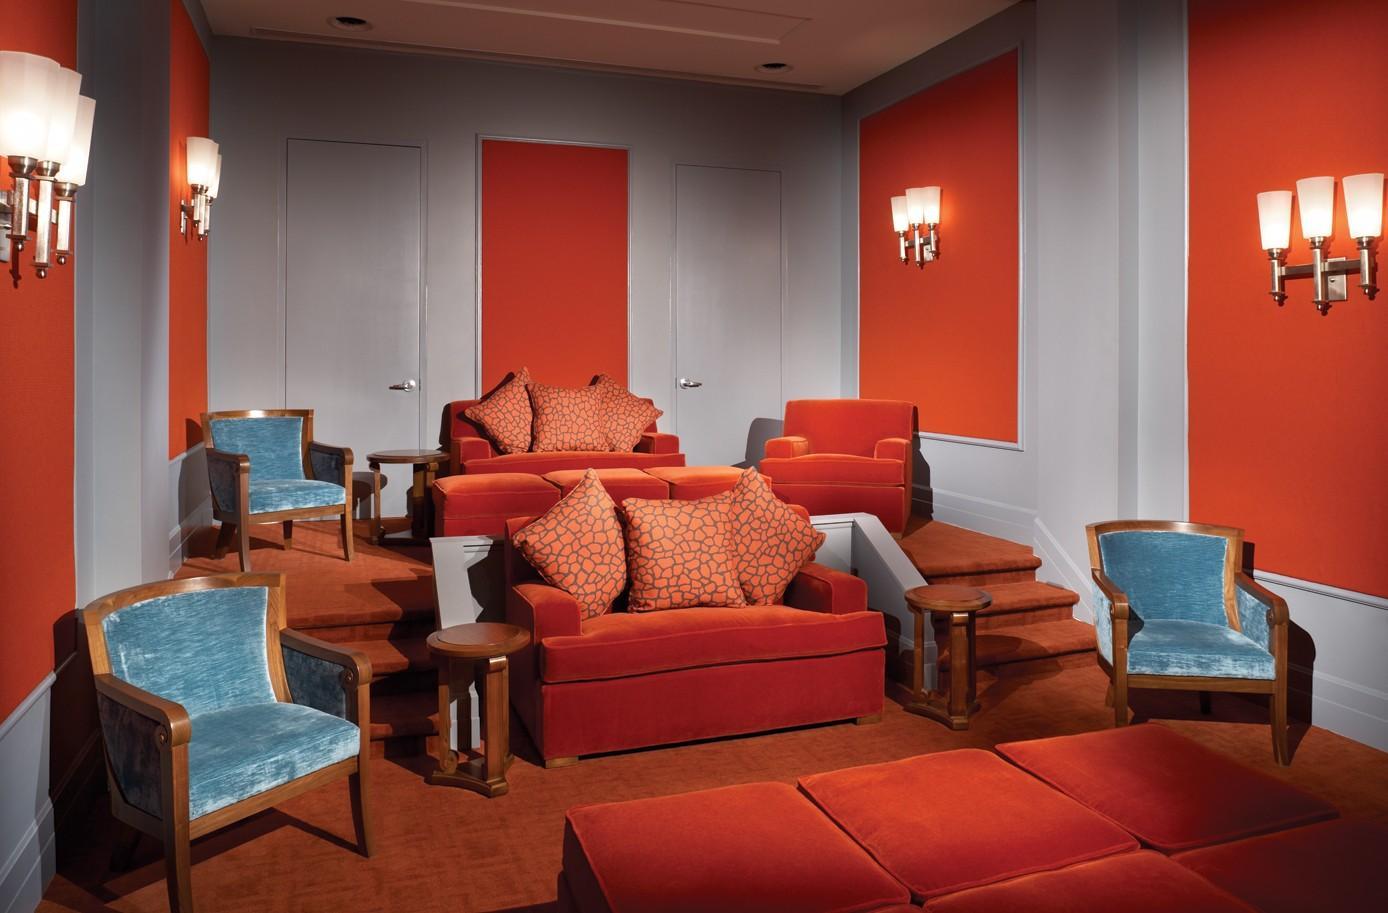 The Gramercy Apartments photo #1